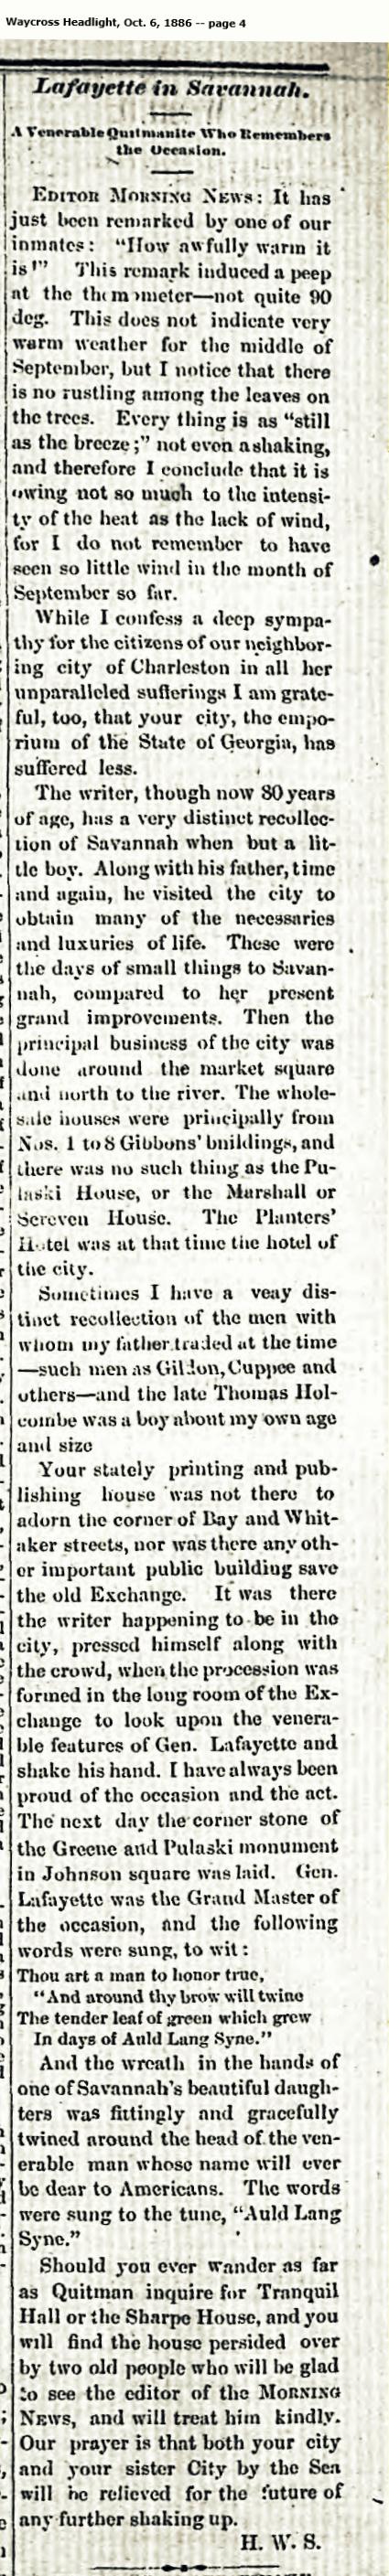 1886-oct-6-hamilton-w-sharpe